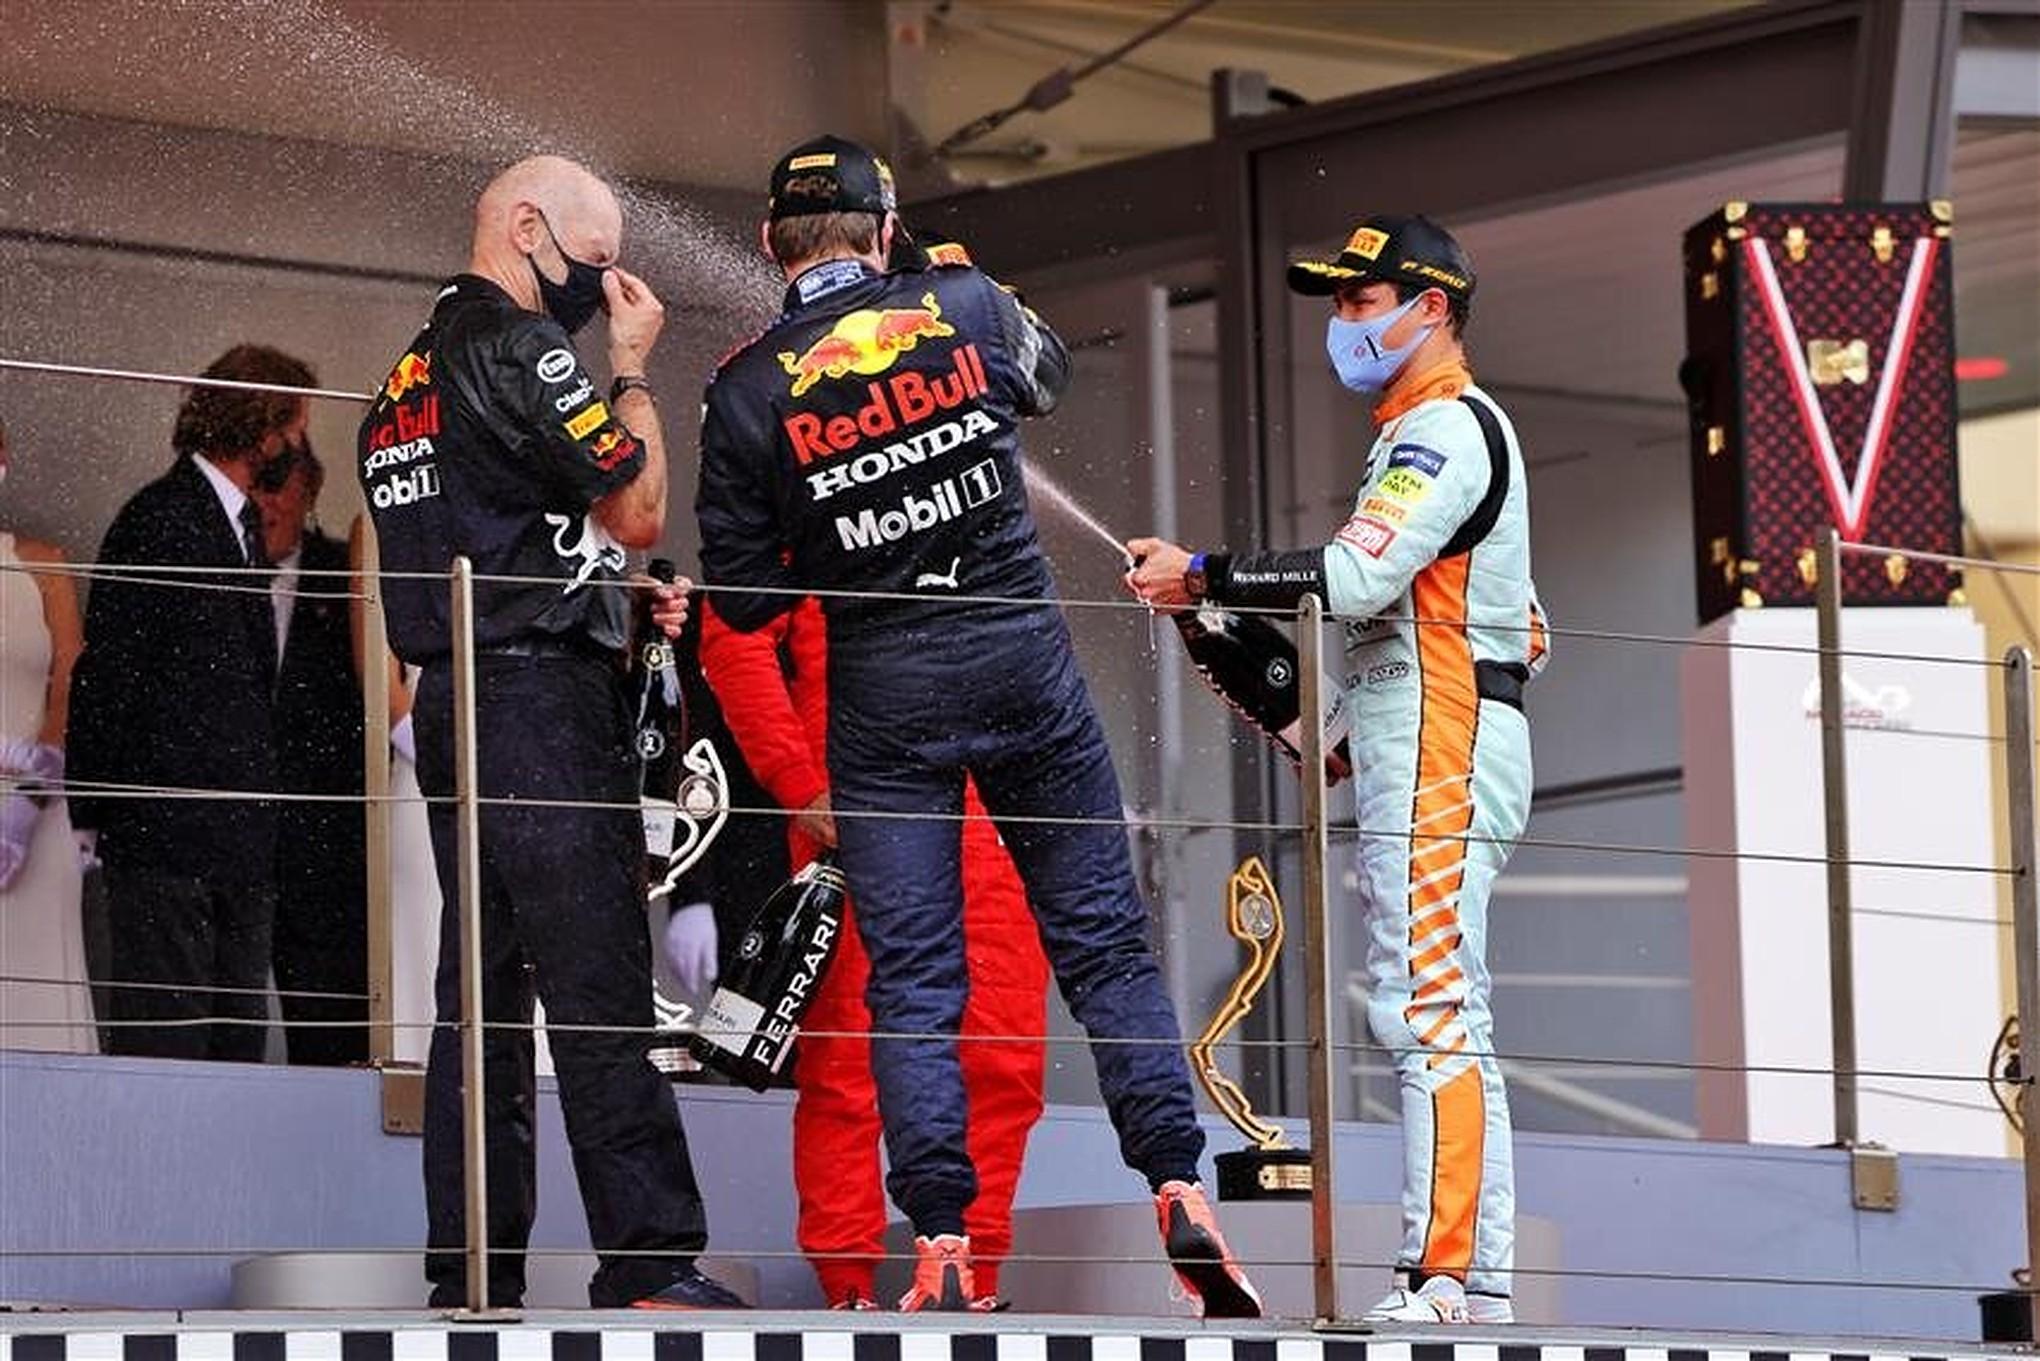 Lando Norris and Max Verstappen at Monaco 2021 - Formula1news.co.uk